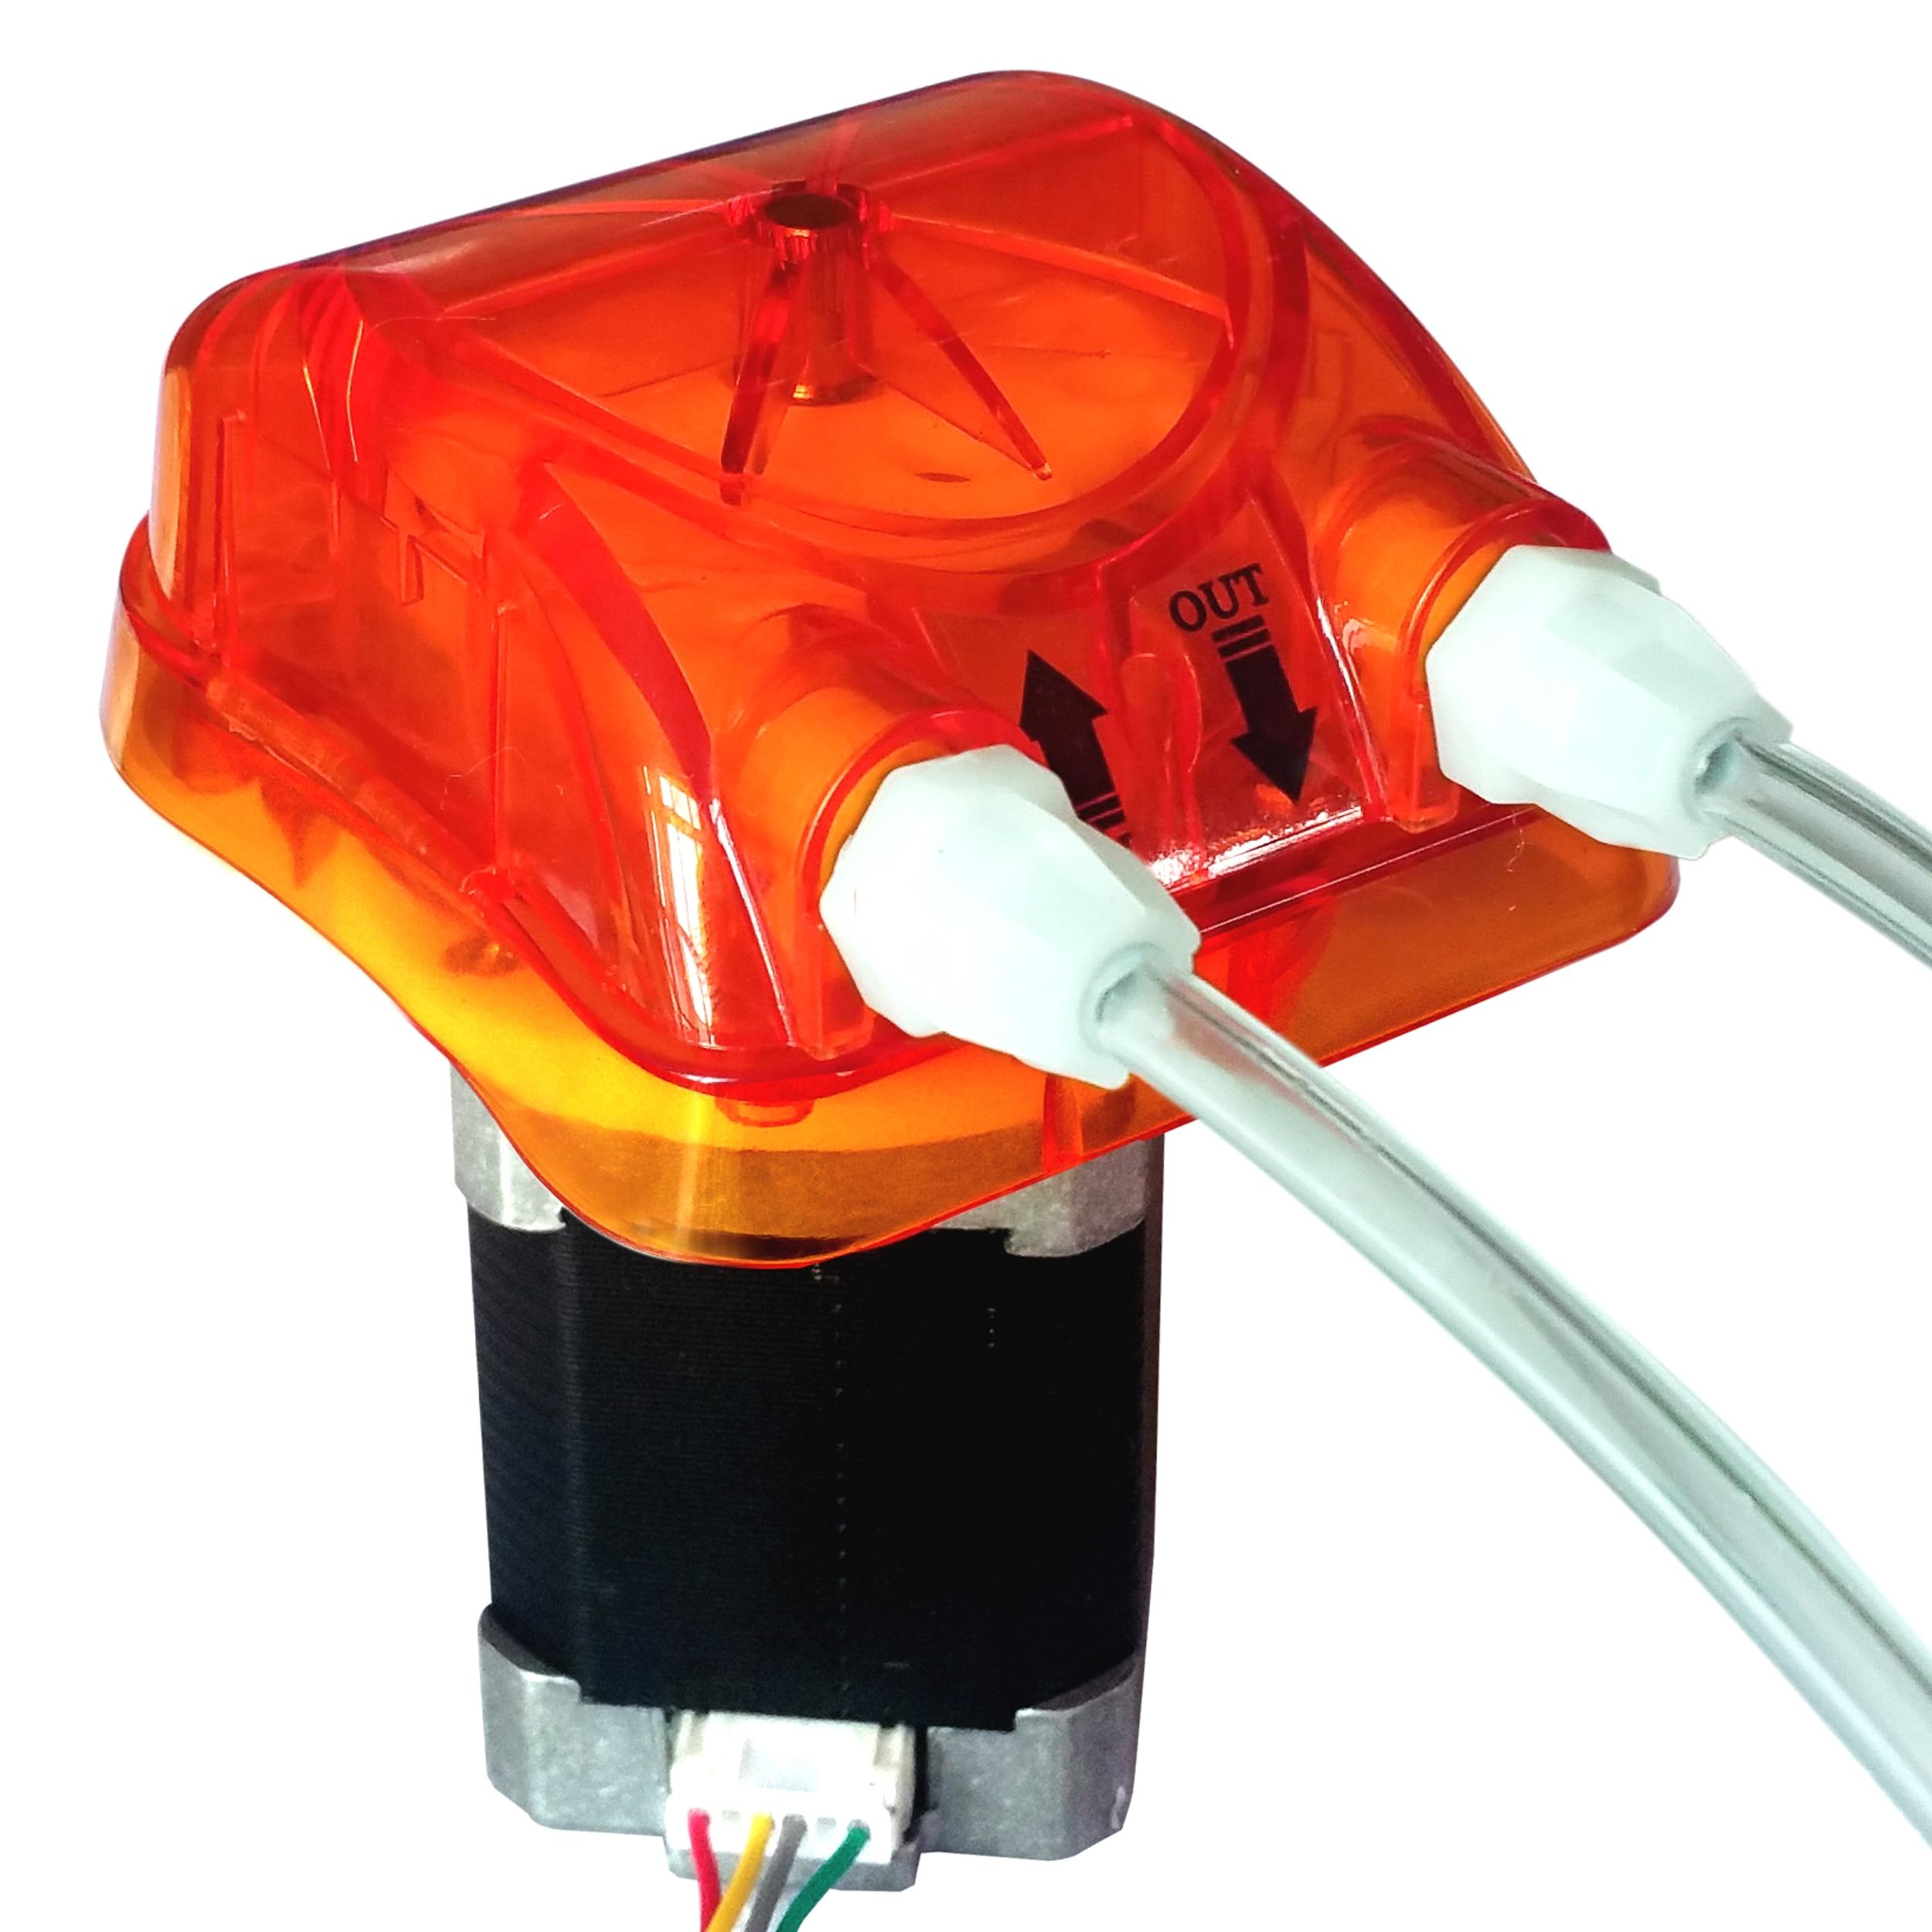 1 ml/min, 4 Rolos, 24 V Pisar Bomba Peristáltica Honlite com Exchangeable Cabeça Da Bomba e BPT PharMed Tubo Peristáltico